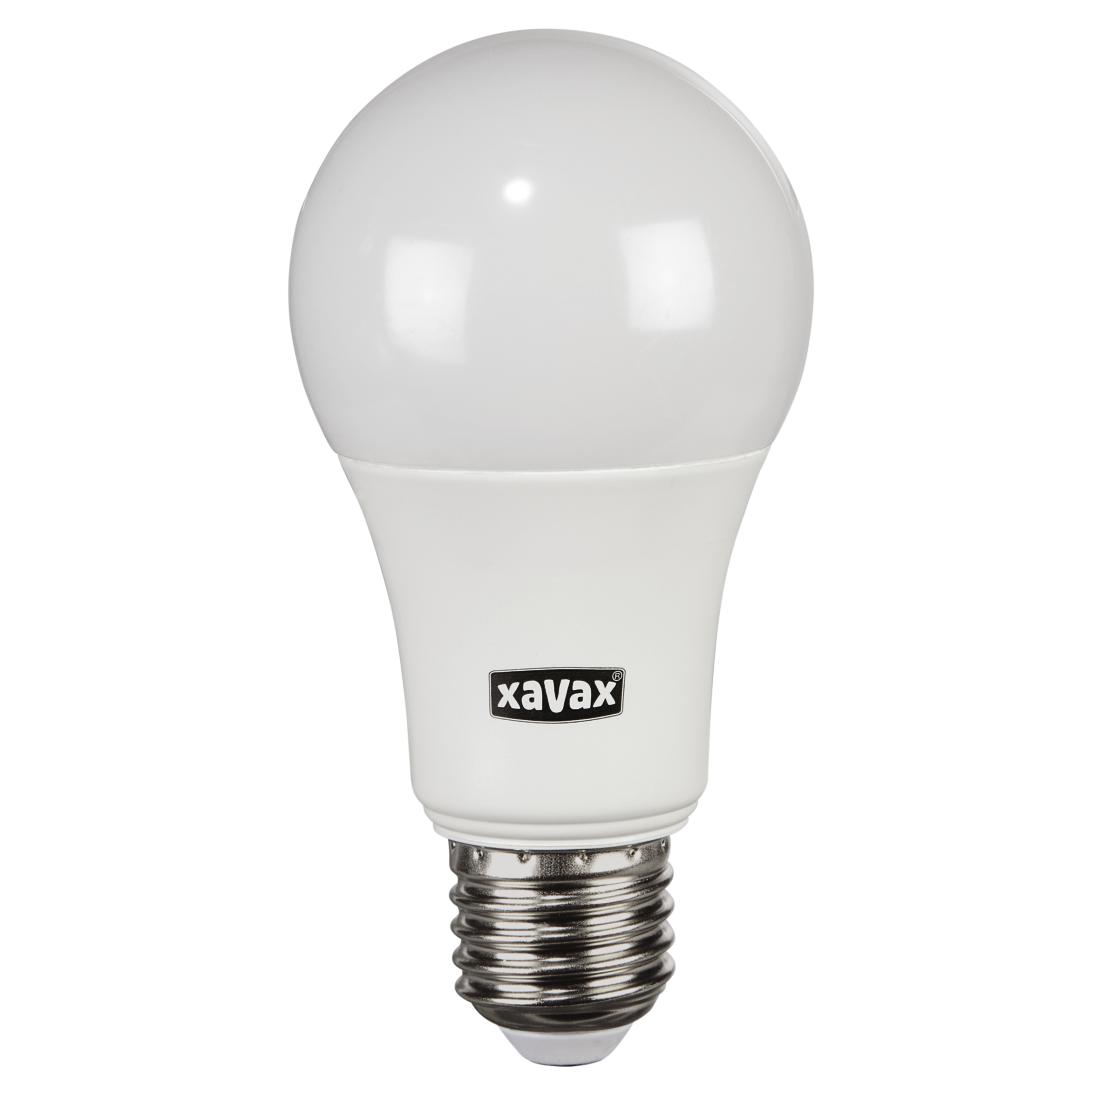 Xavax - Die Starke Marke im Haushalt xavax.eu | 00112288 Xavax LED ...